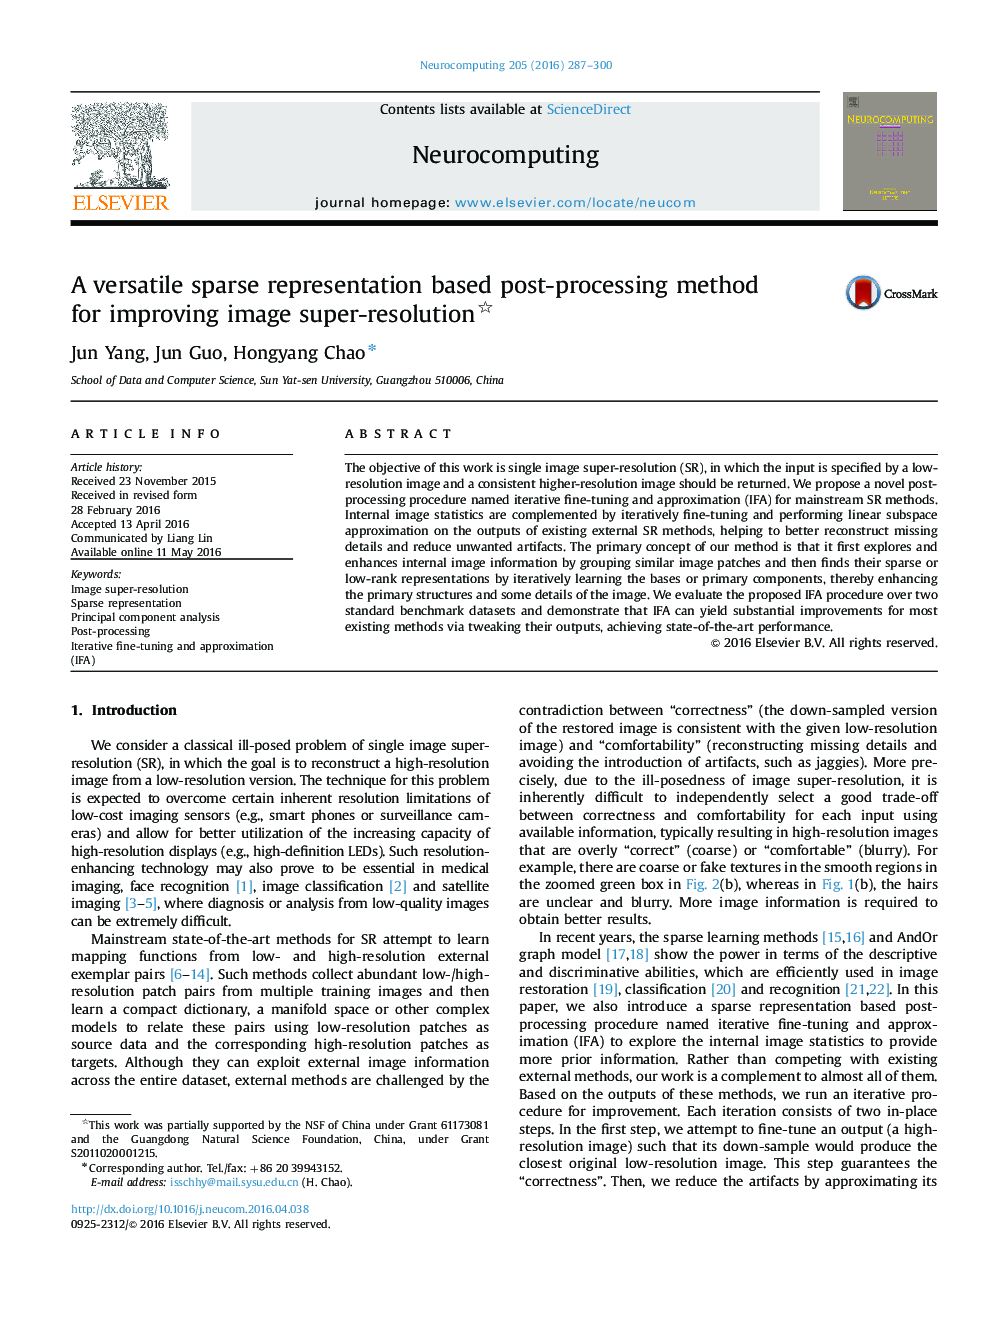 A versatile sparse representation based post-processing method for